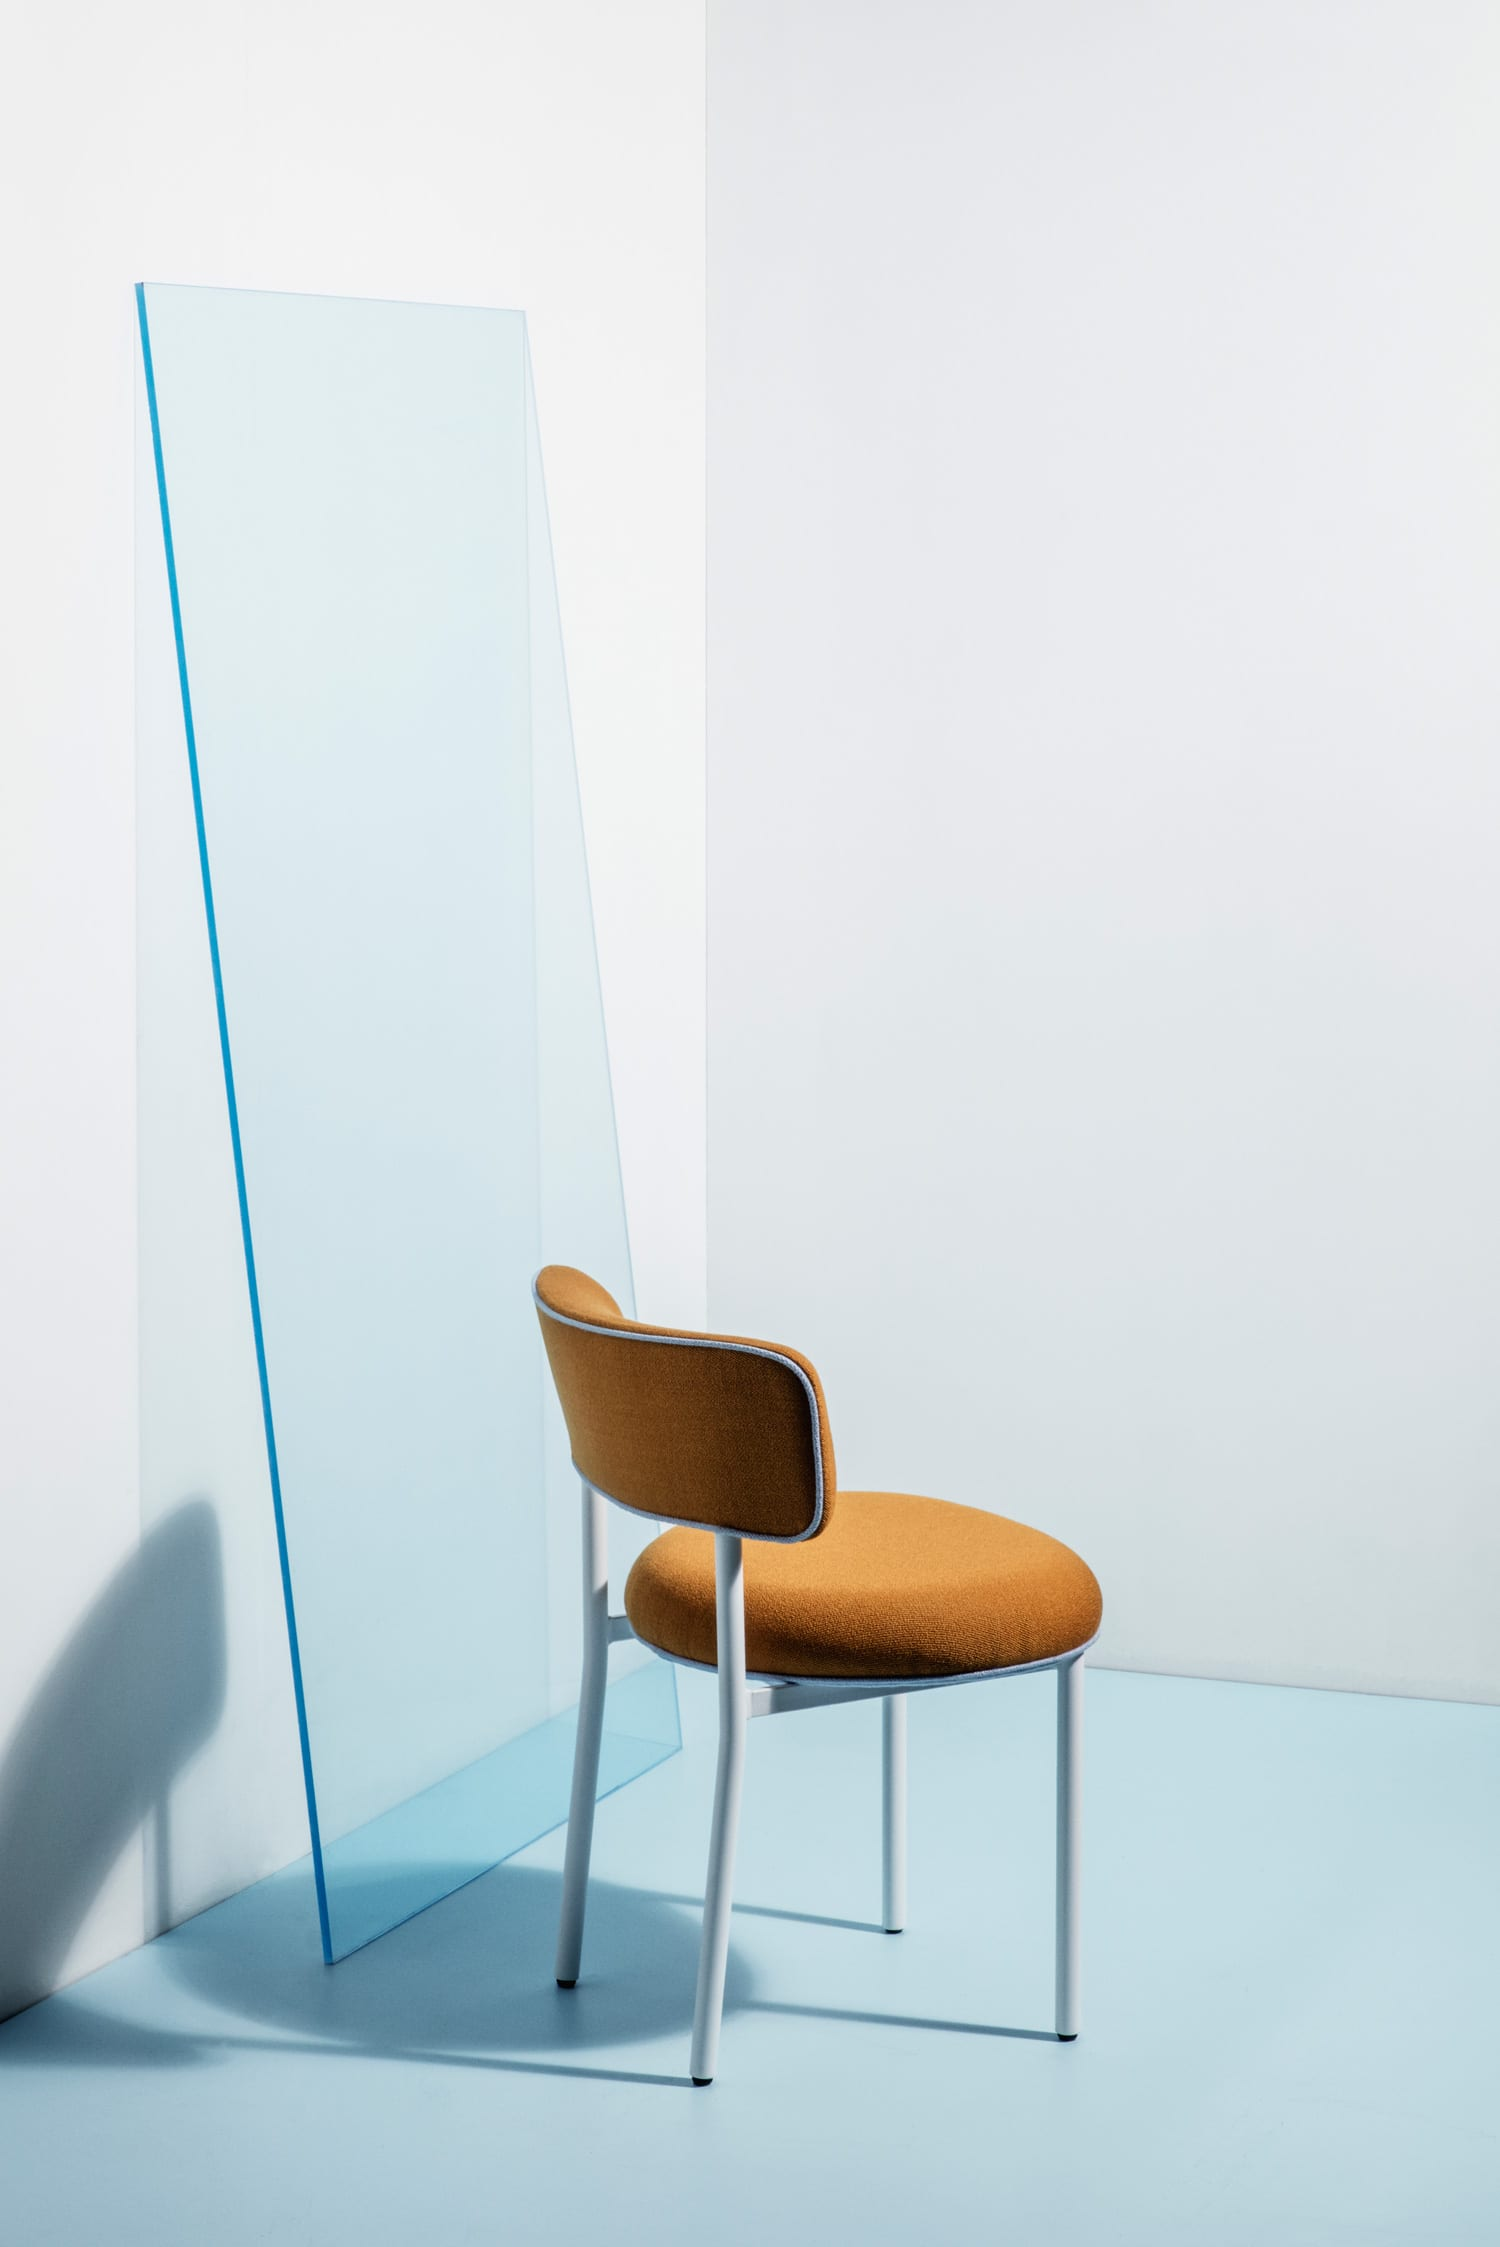 Studio David Thulstrup for Mobel Copenhagen at IMM Cologne 2018   Yellowtrace